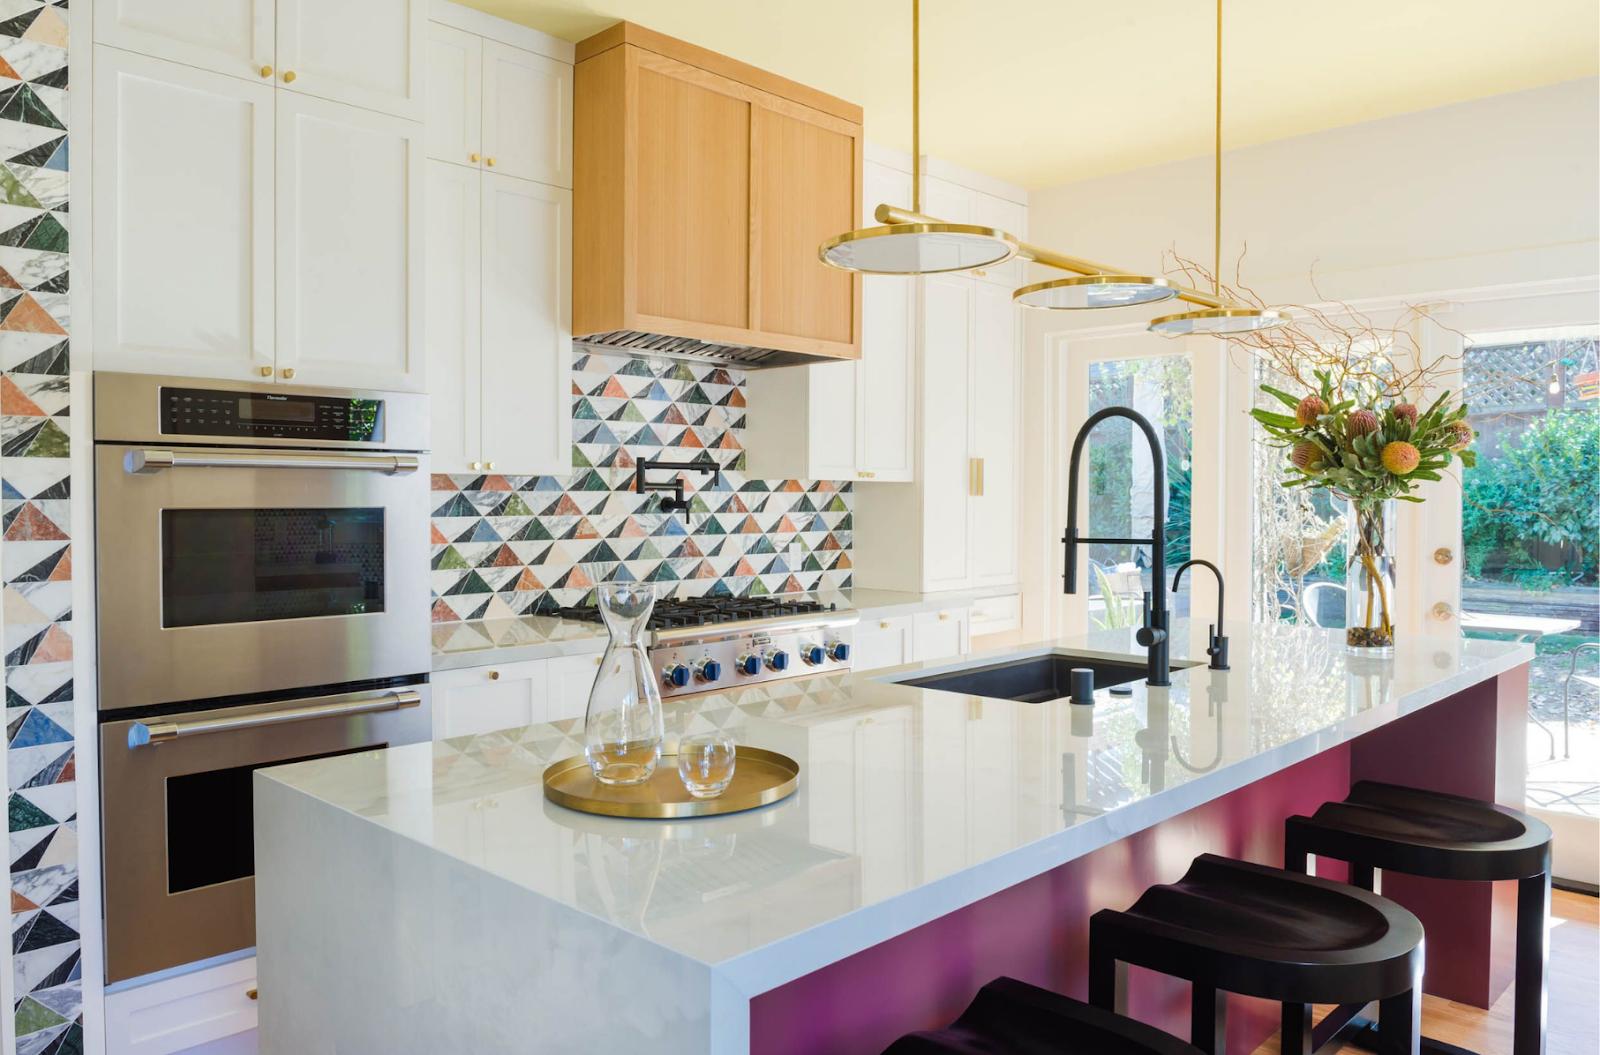 joy street design kitchen after magenta island waterfall countertop brass pendants geometric tile